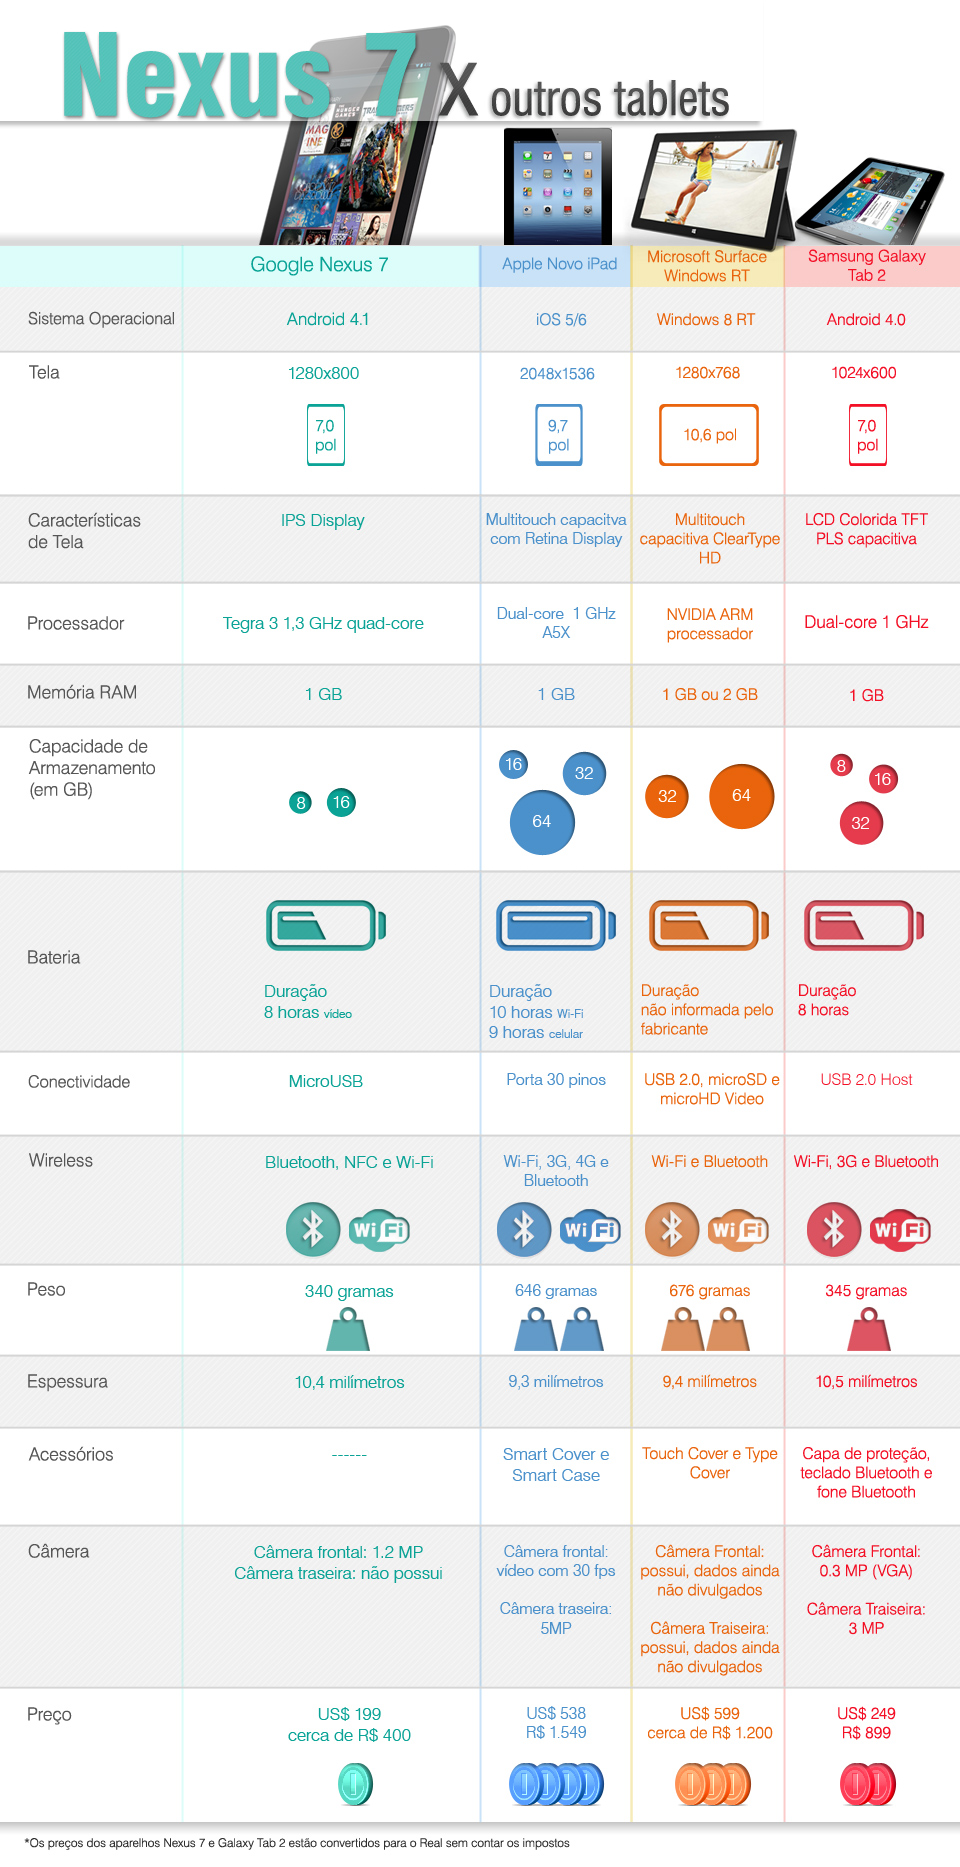 Comparativo: Nexus 7 x outros tablets